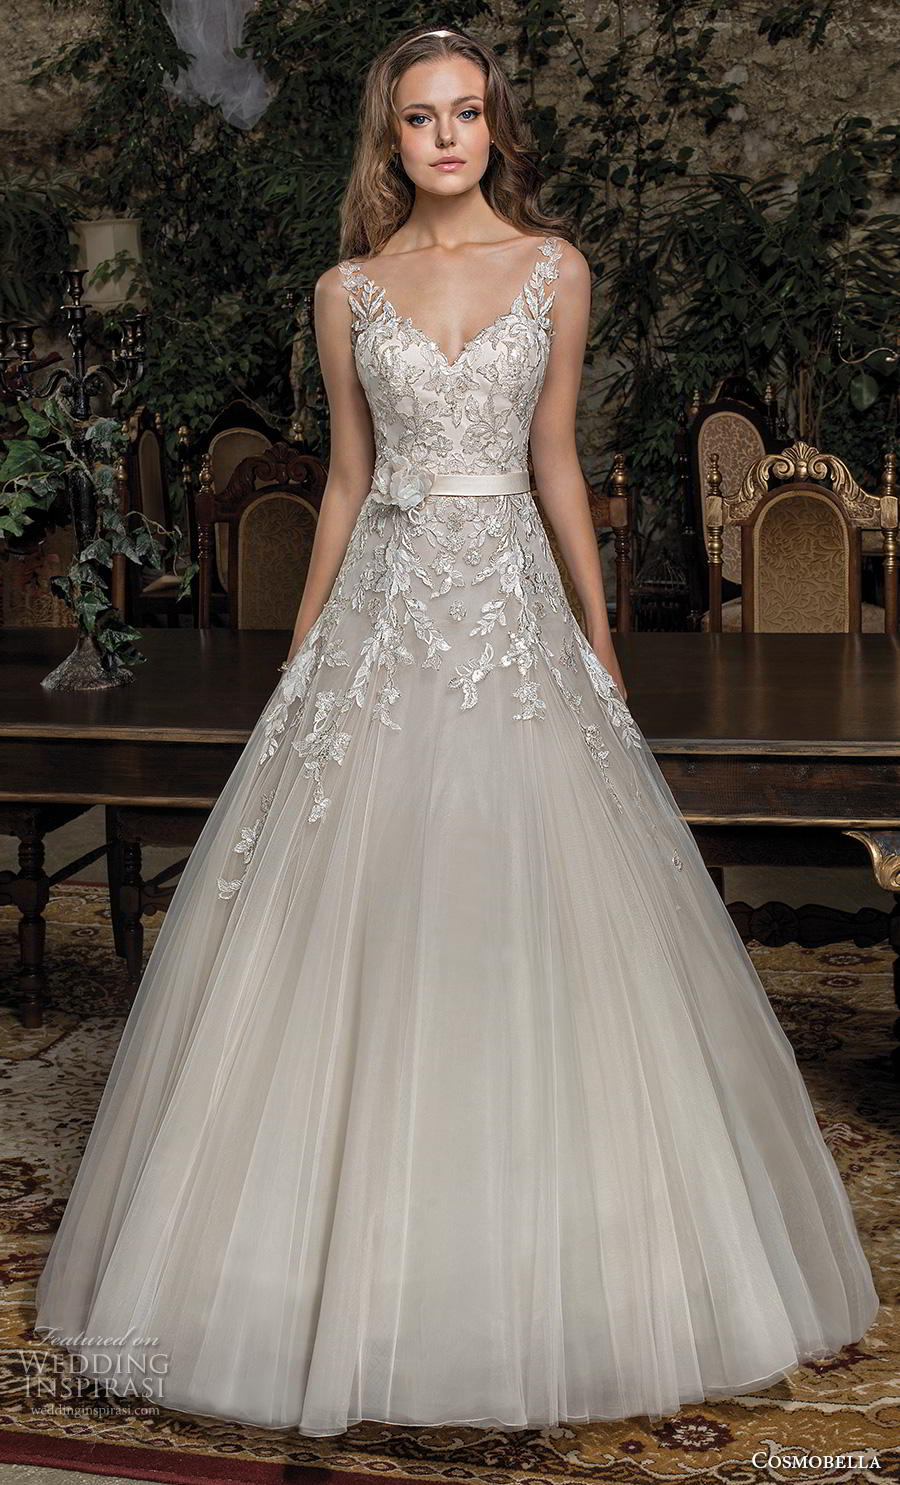 cosmobella 2019 bridal sleeveless with strap v neck heavily embellished bodice romantic a  line wedding dress backless scoop back chapel train (11) mv